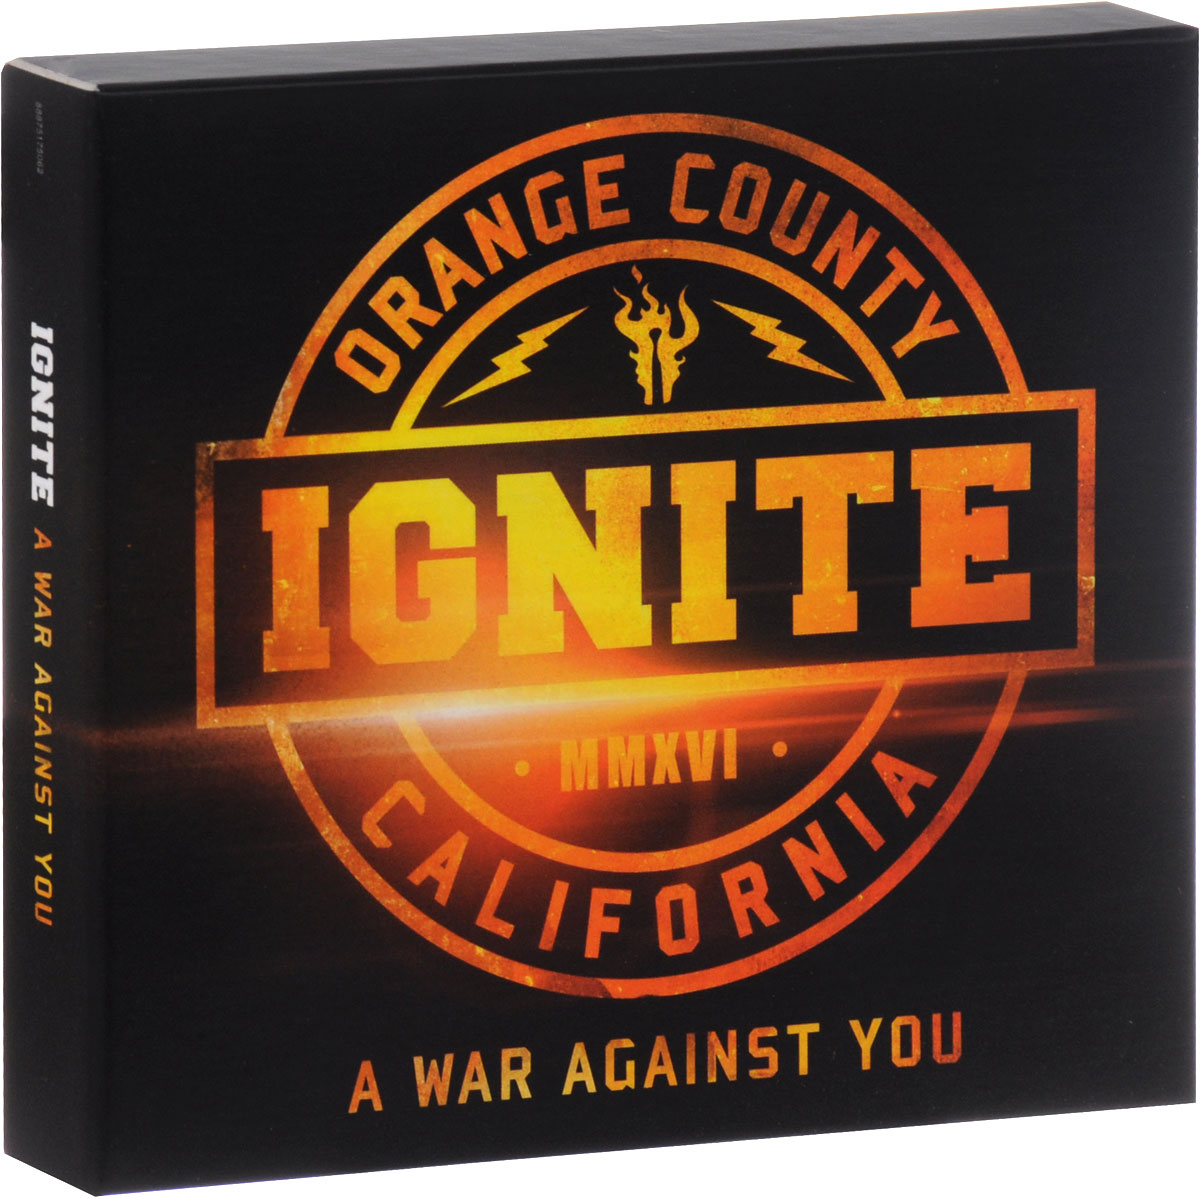 Ignite Ignite. A War Against You stephen johnson scott emergent ignite purpose transform culture make change stick